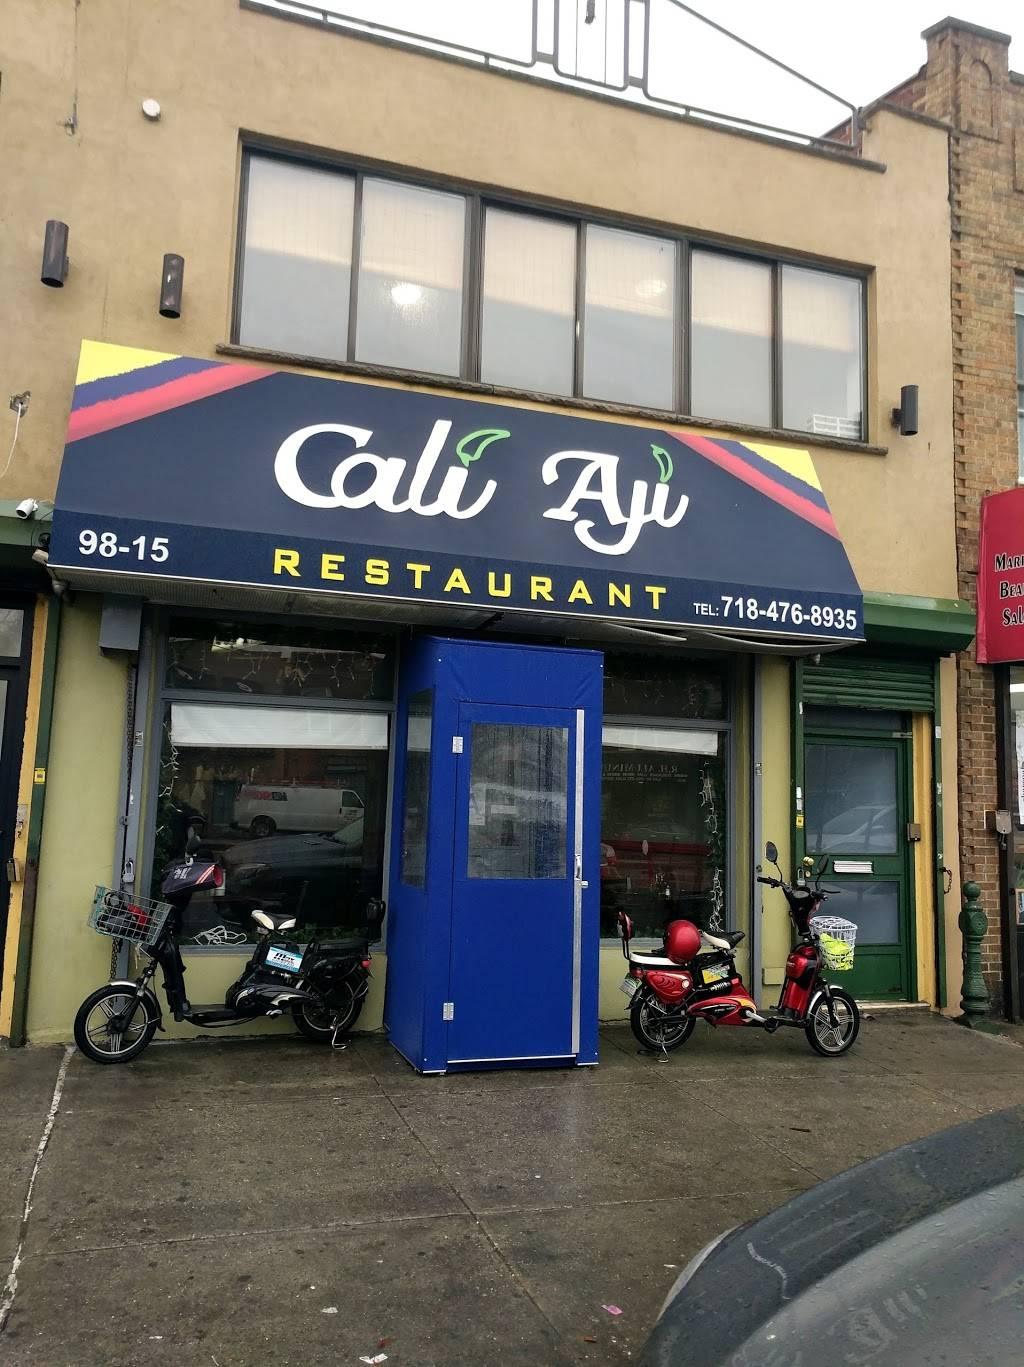 Cali Aji | restaurant | 98-15 Astoria Blvd, East Elmhurst, NY 11369, USA | 7184768935 OR +1 718-476-8935